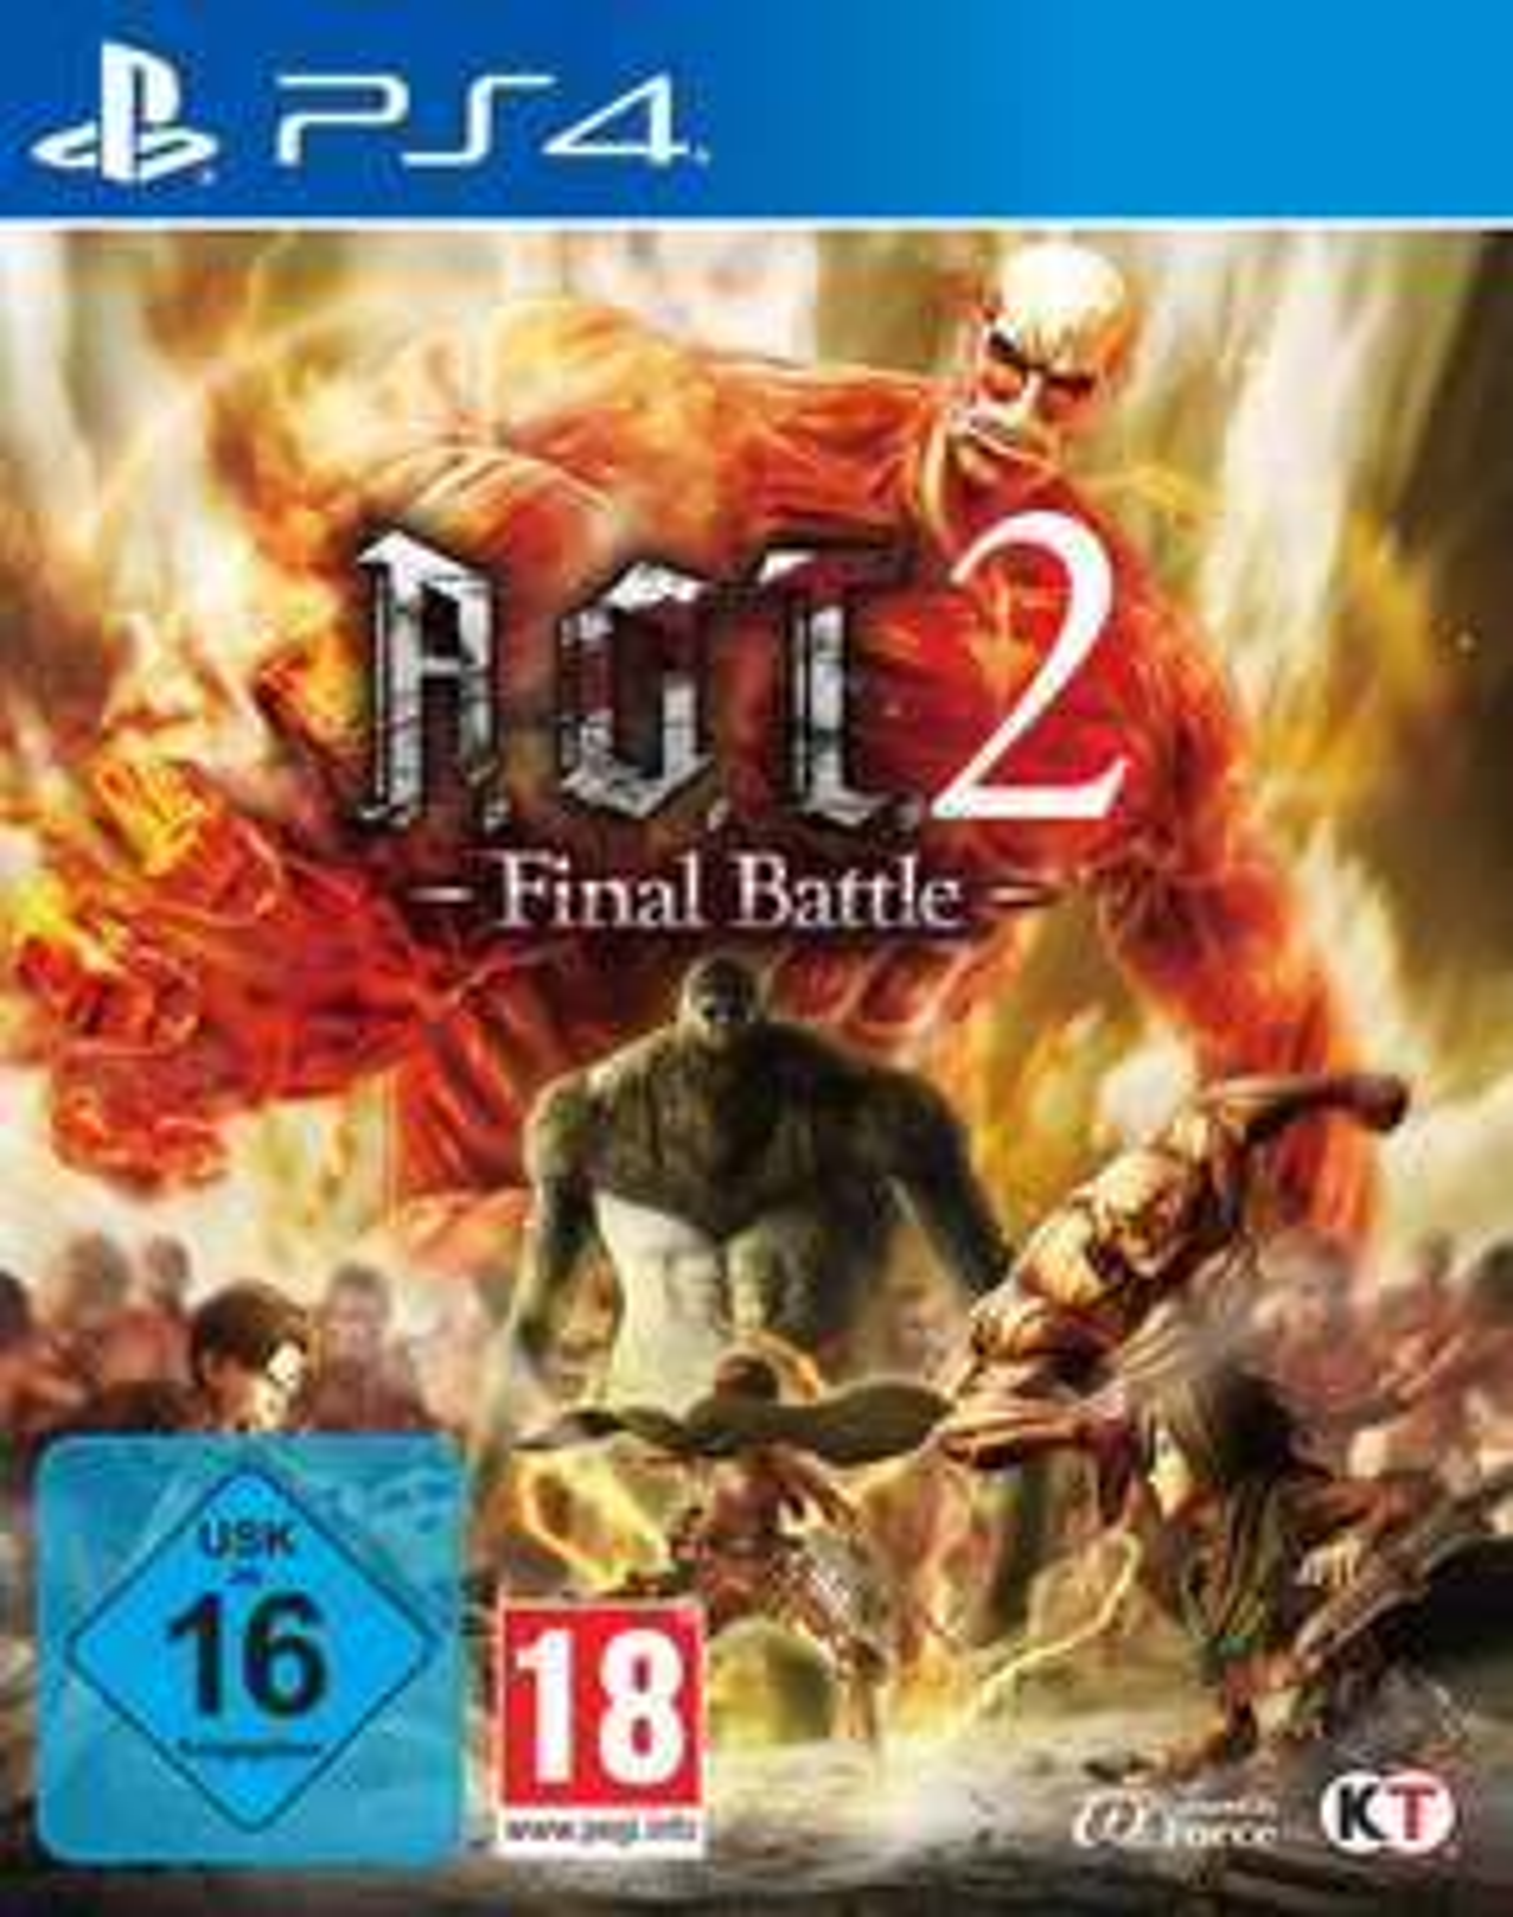 [PS4] A.O.T. 2 - Final Battle (Attack on Titan) (Thalia.de)